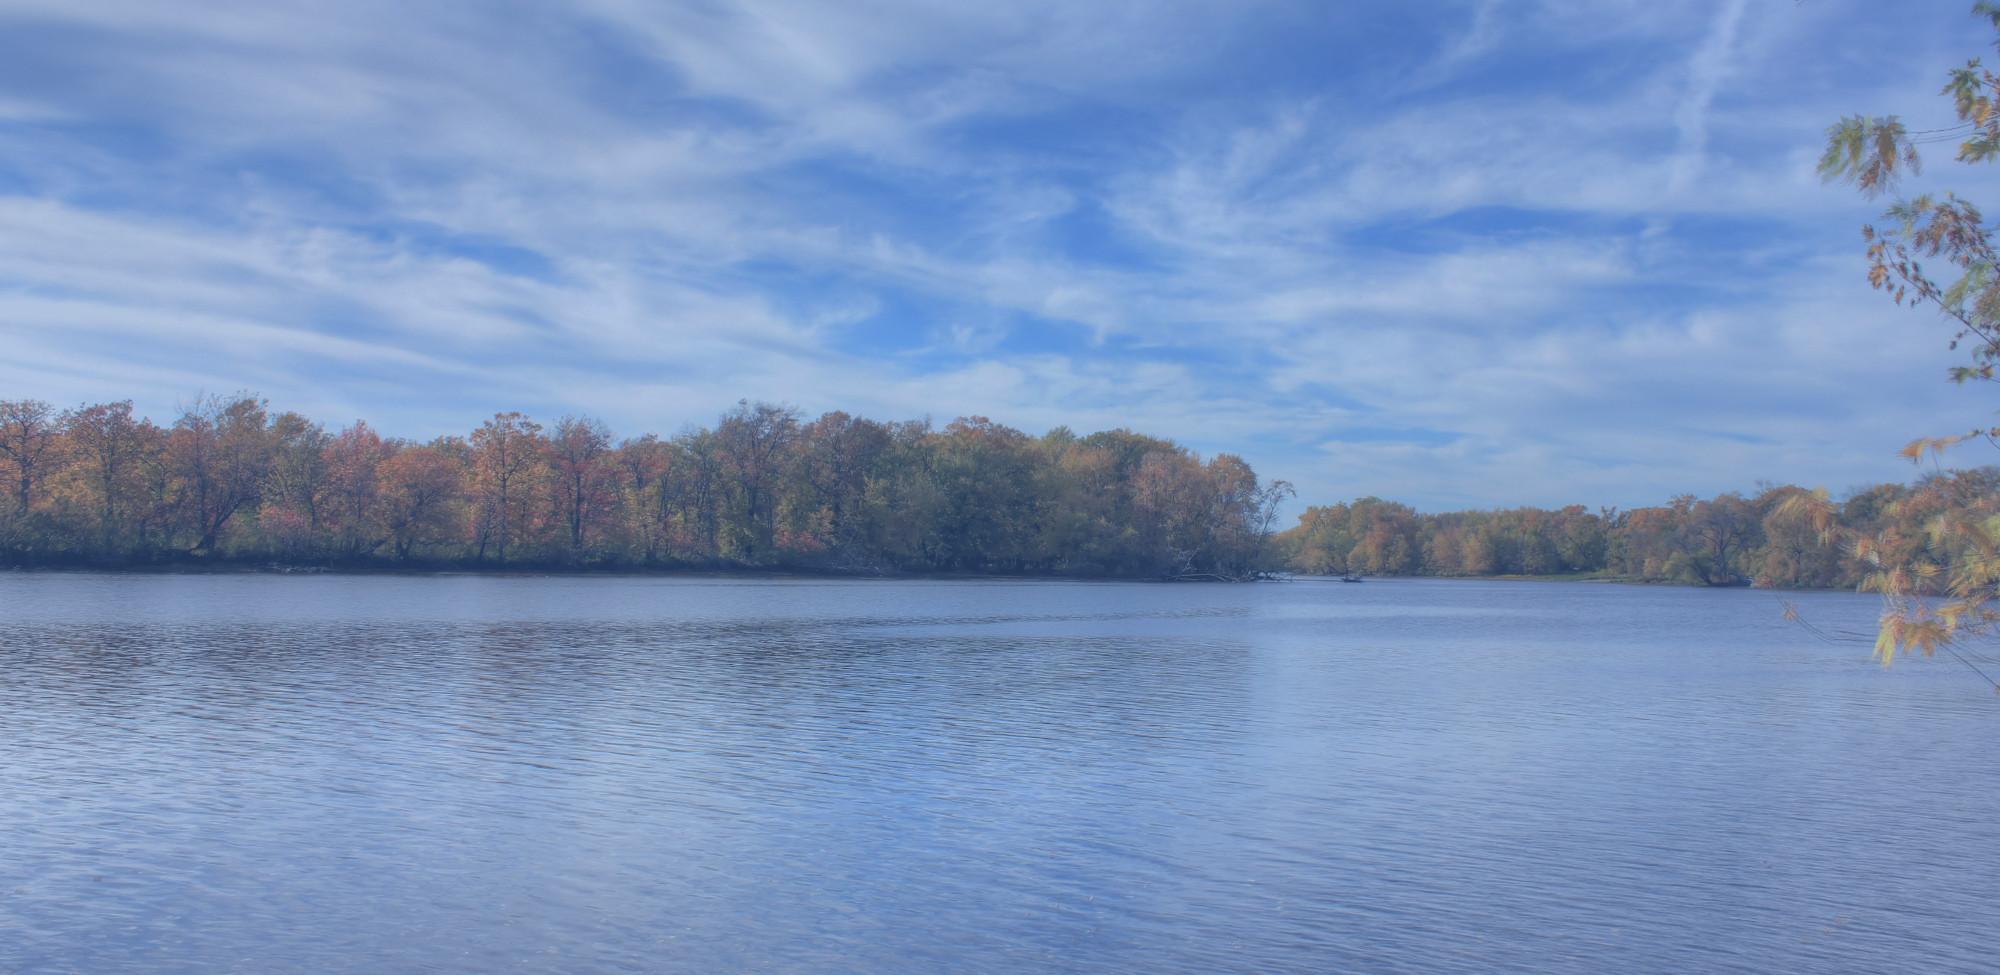 merrick-park-river